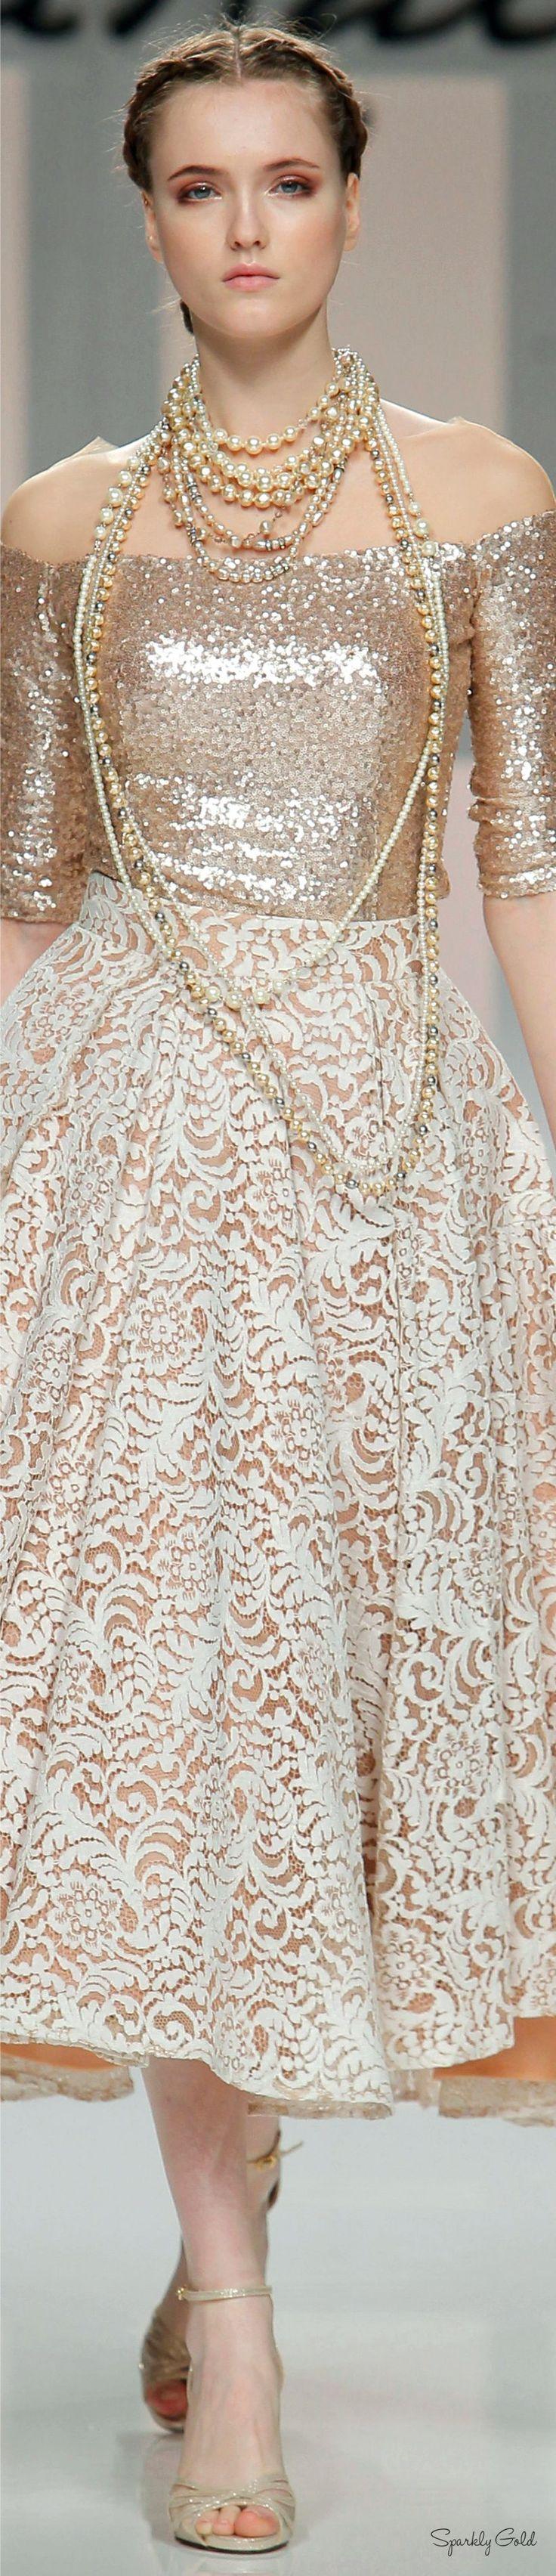 Carla Ruiz 2017- Palais Royal http://trendynesia.com/50-winter-outfits-to-copy-right-now/